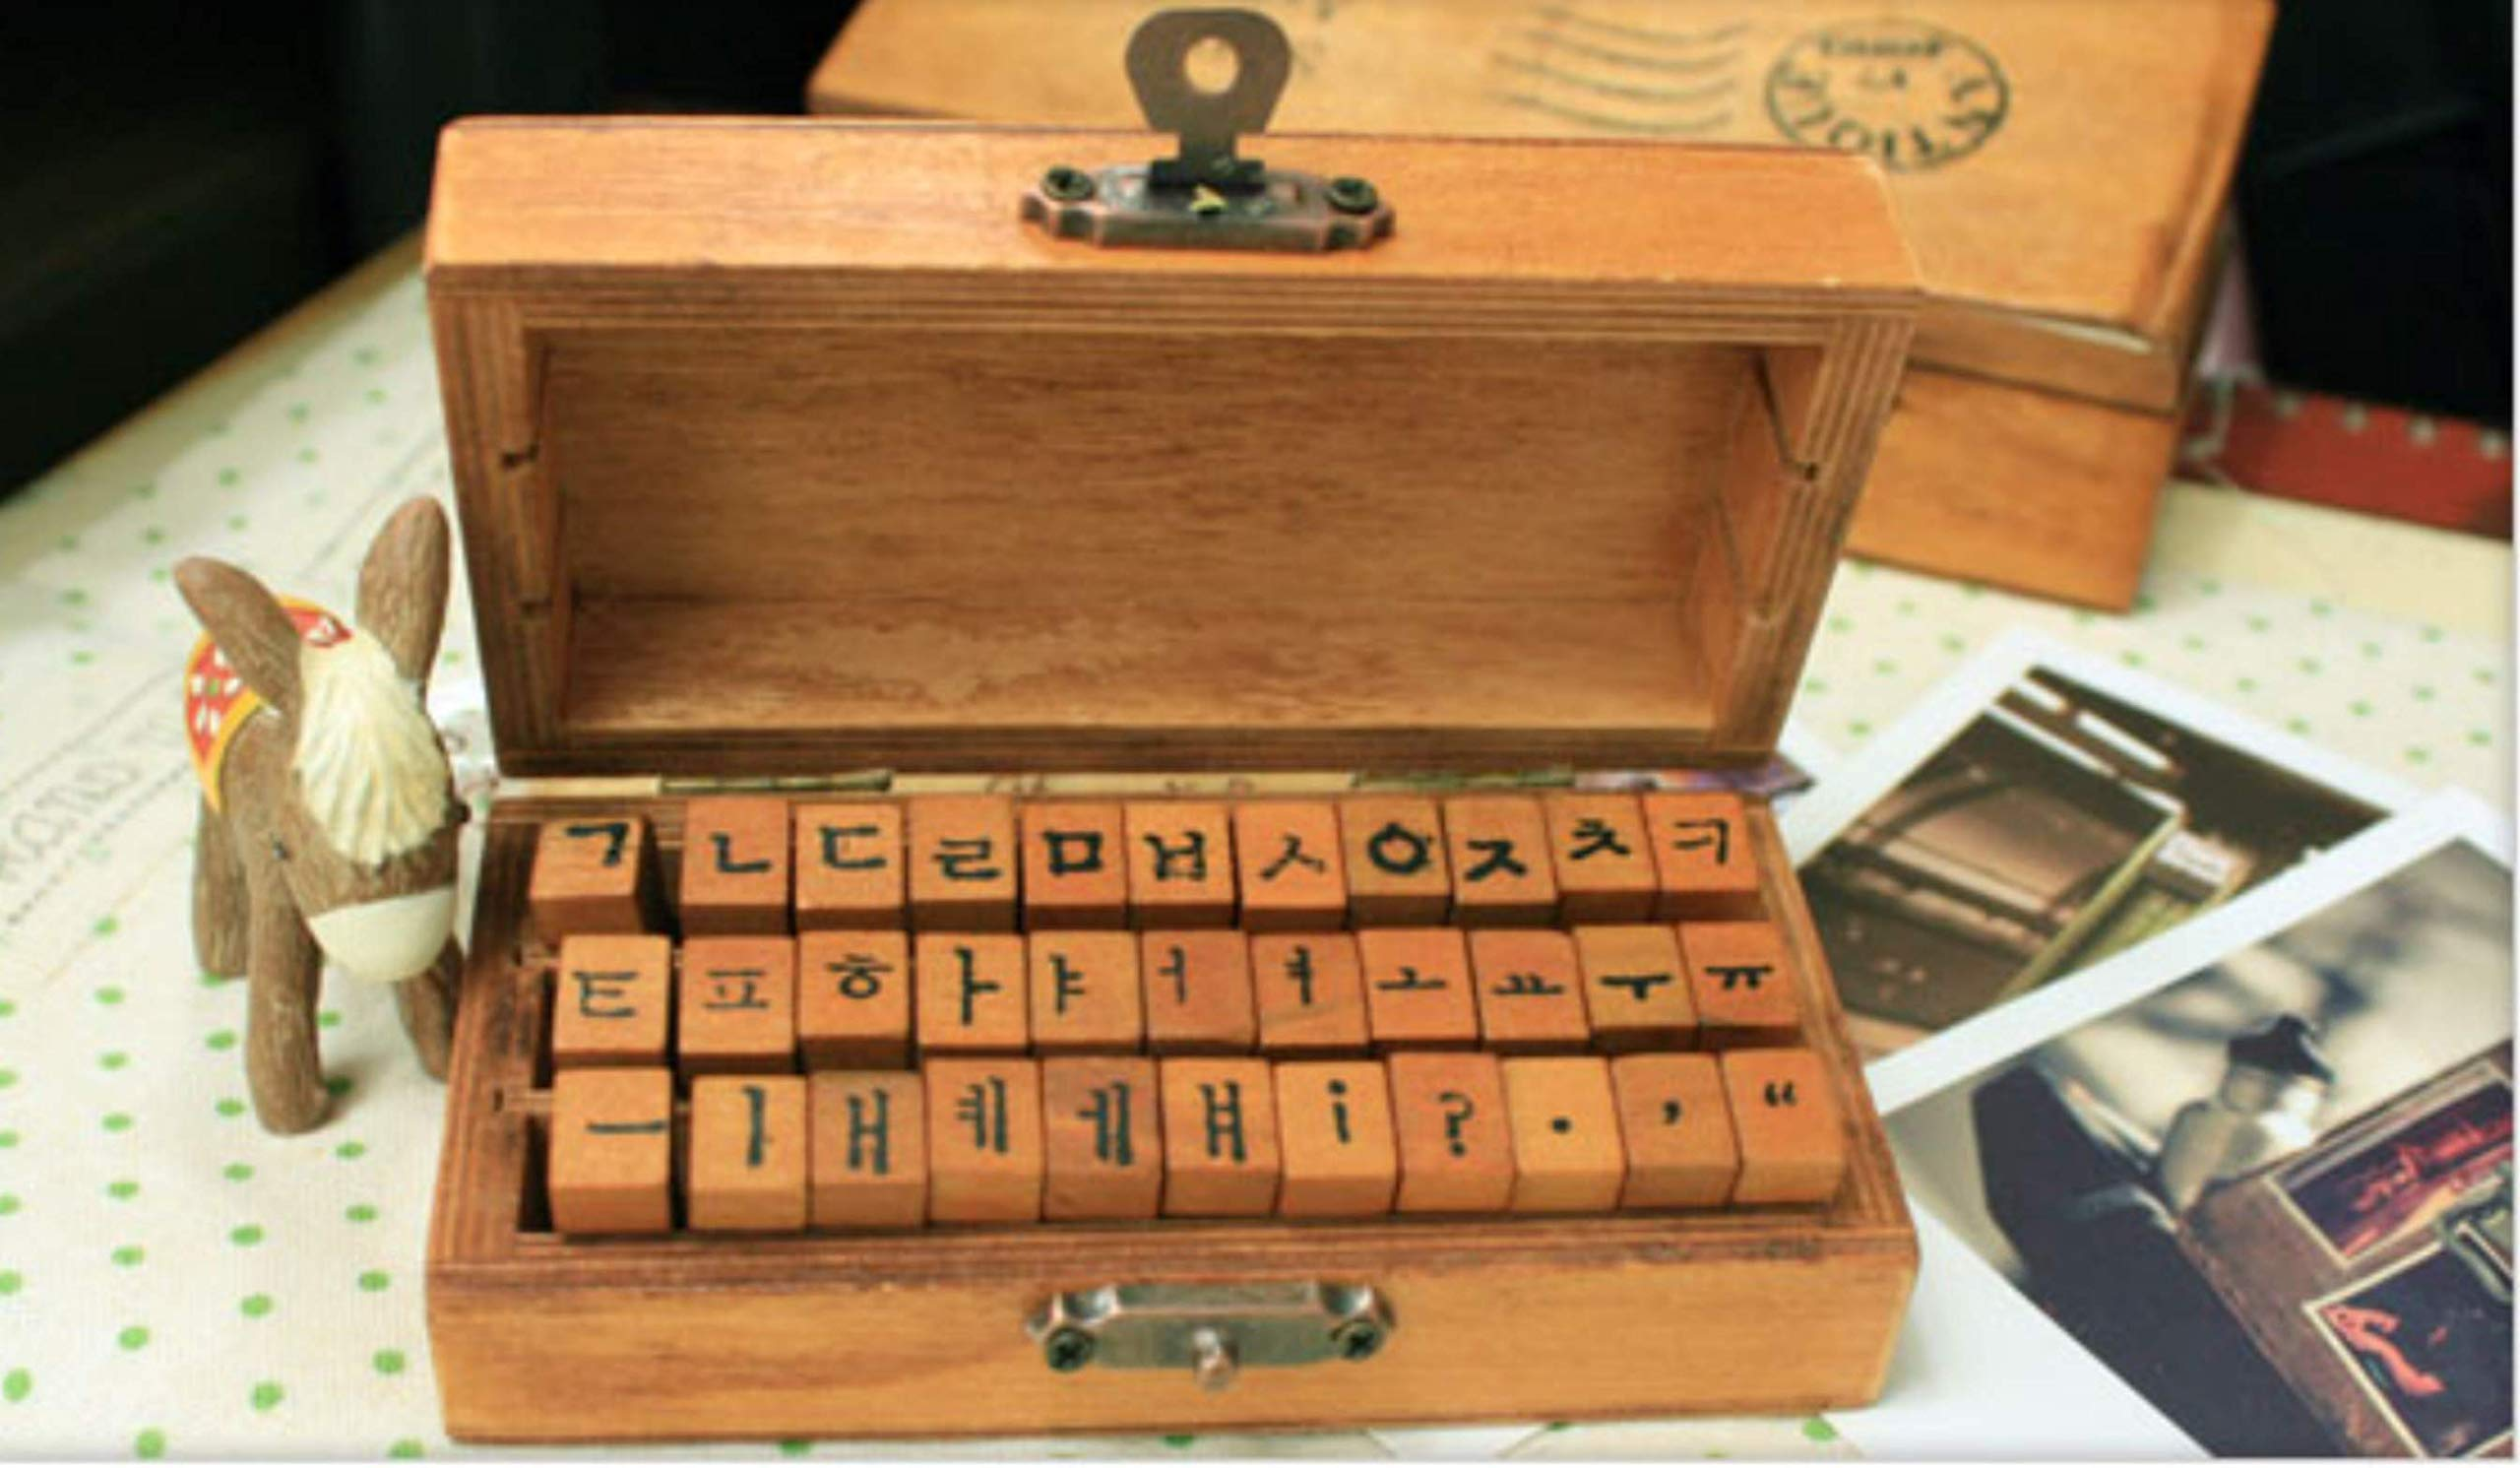 Korean Alphabet Rubber Stamp (33 Pcs) Bundle w/Black Ink Pad 한글 스탬프 Characters Wooden Box Vintage Antique Finish - Typewriter Font by Hanji Avenue